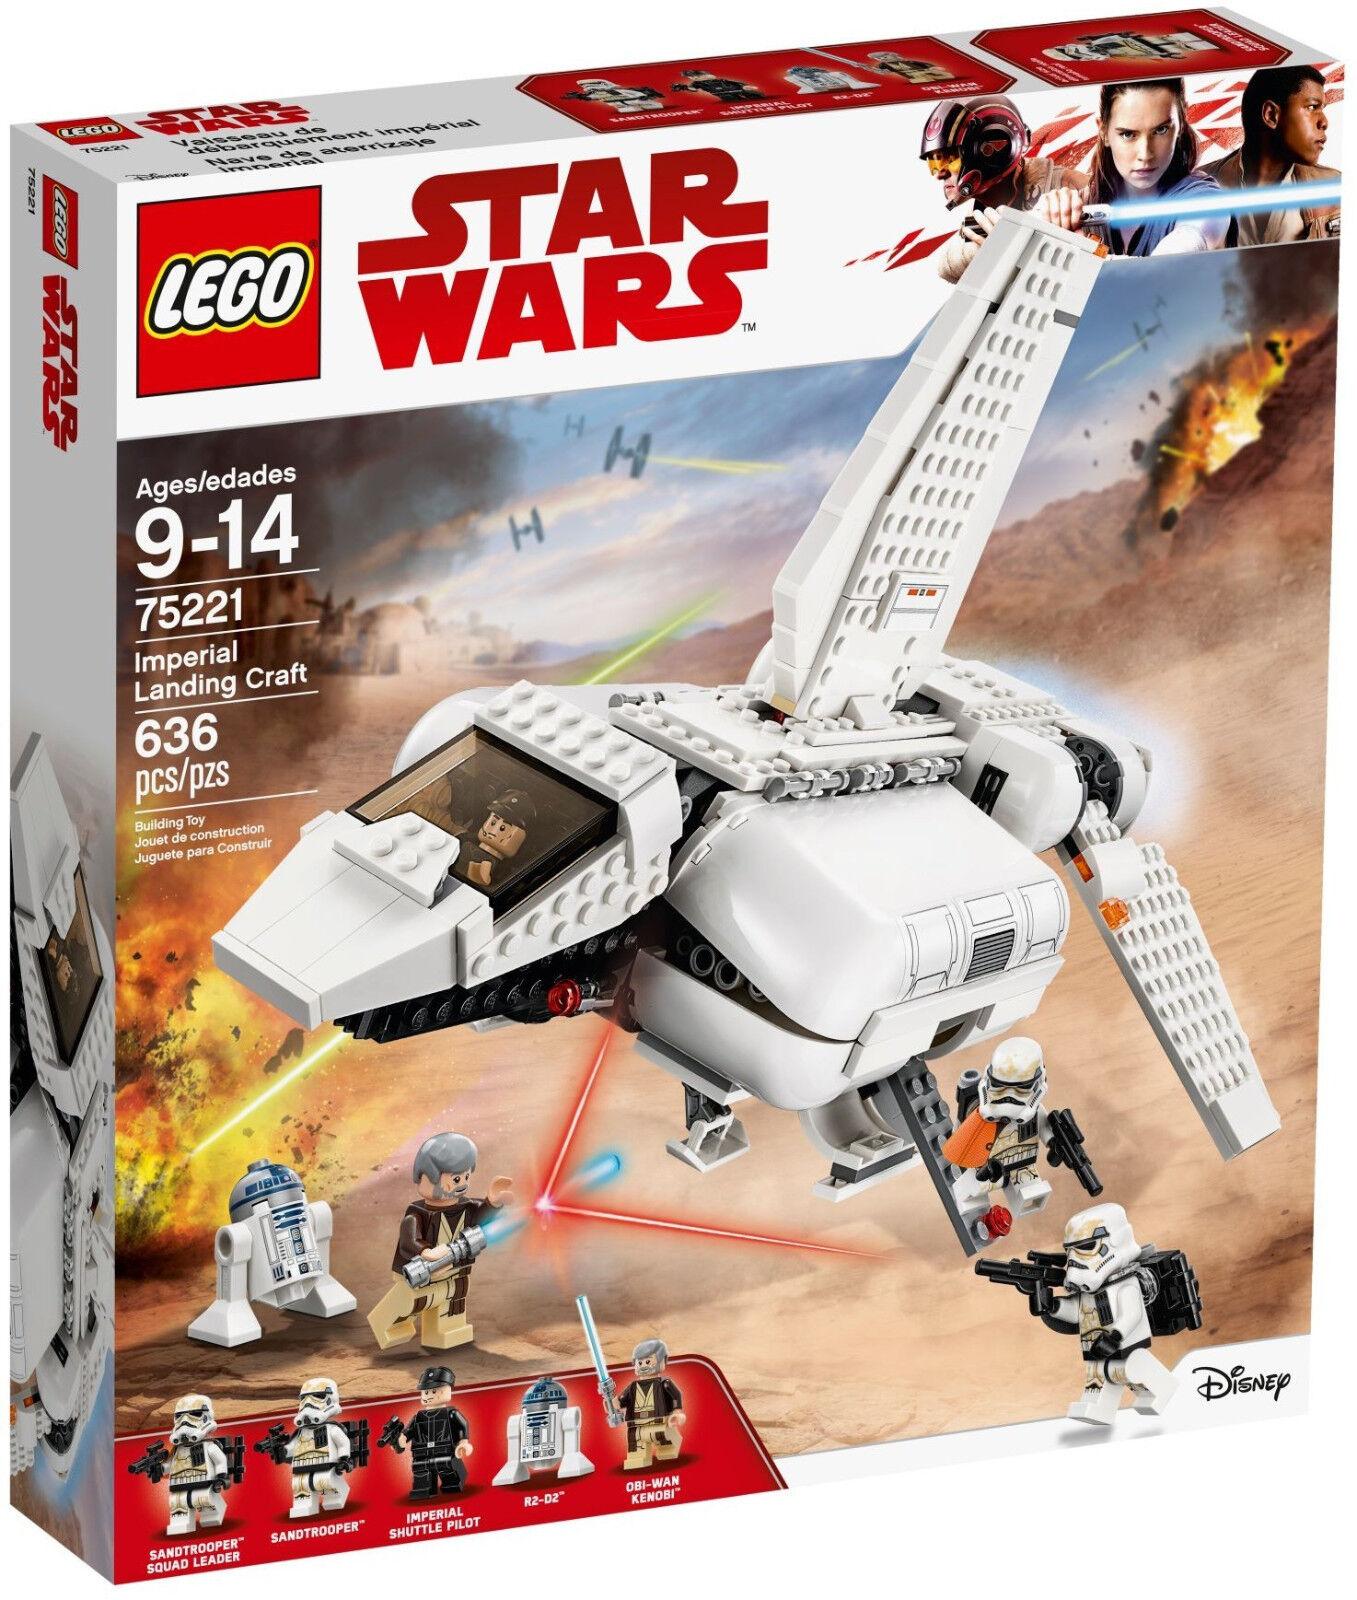 LEGO Star Wars - 75221 Imperiale Landefähre / Imperial Landing OVP Craft - Neu OVP Landing d02eac